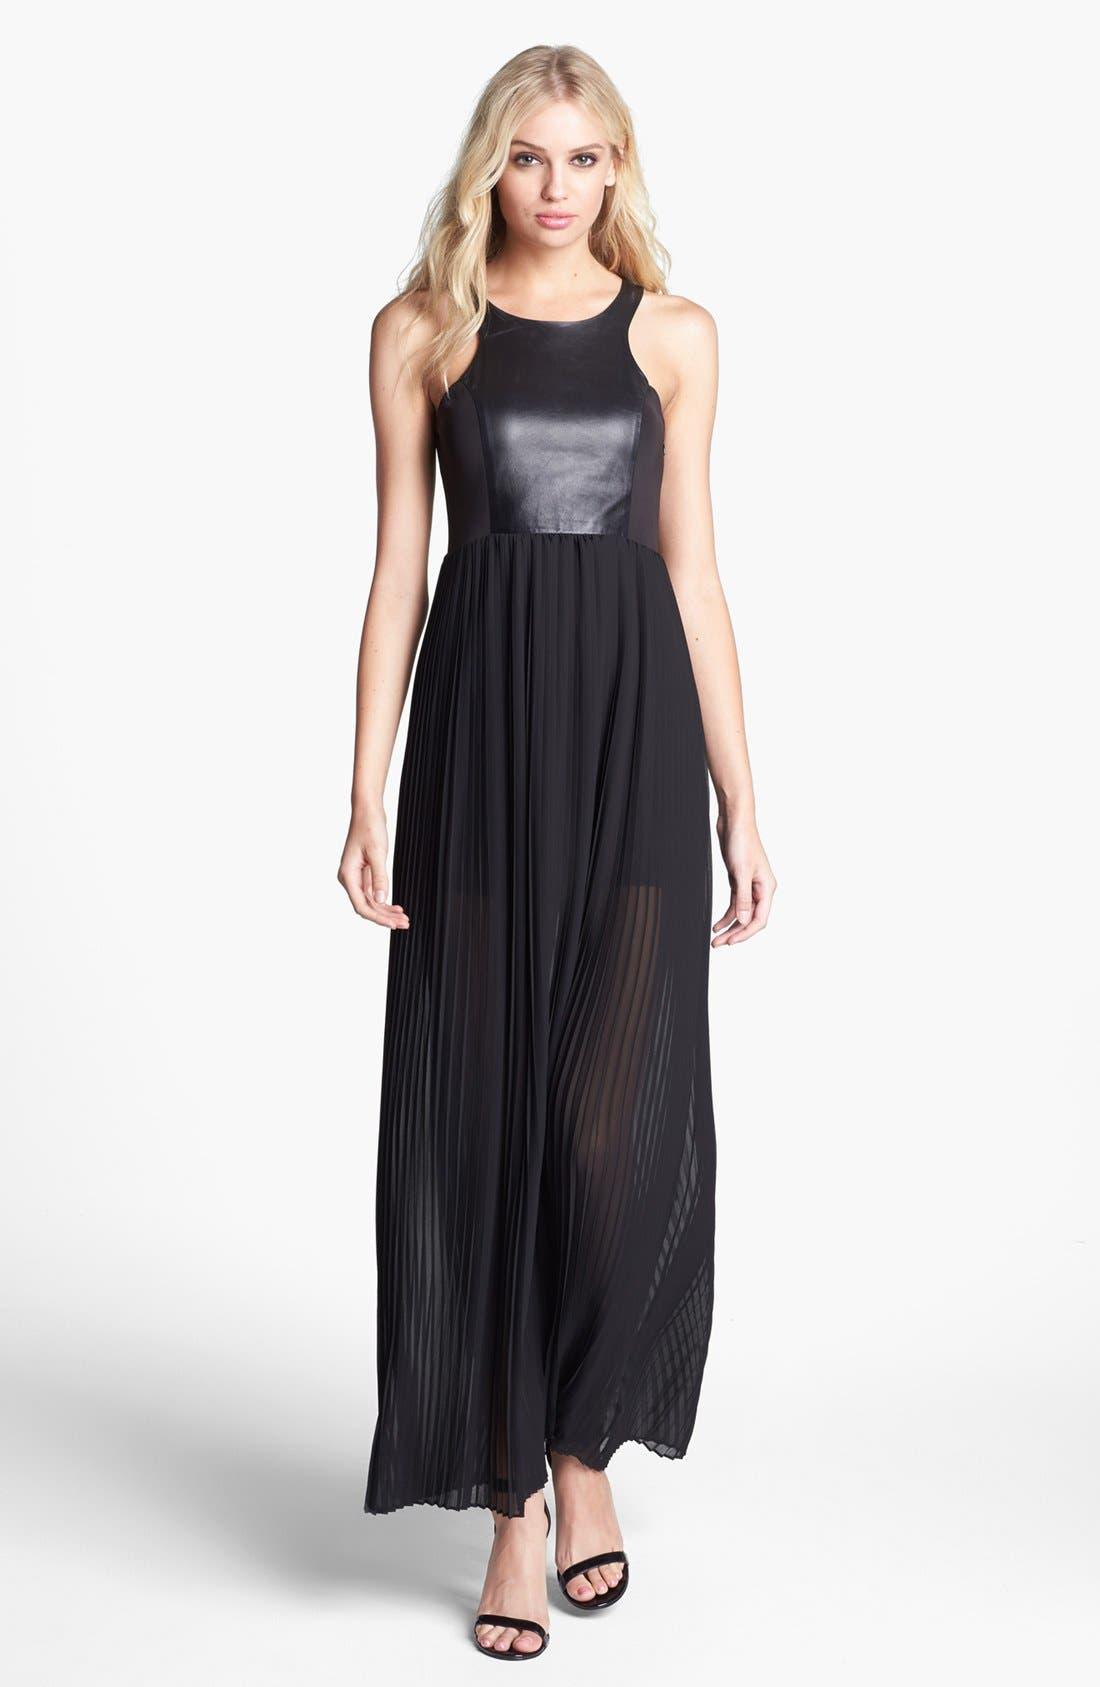 Main Image - BLAQUE LABEL Faux Leather & Pleat Chiffon Maxi Dress